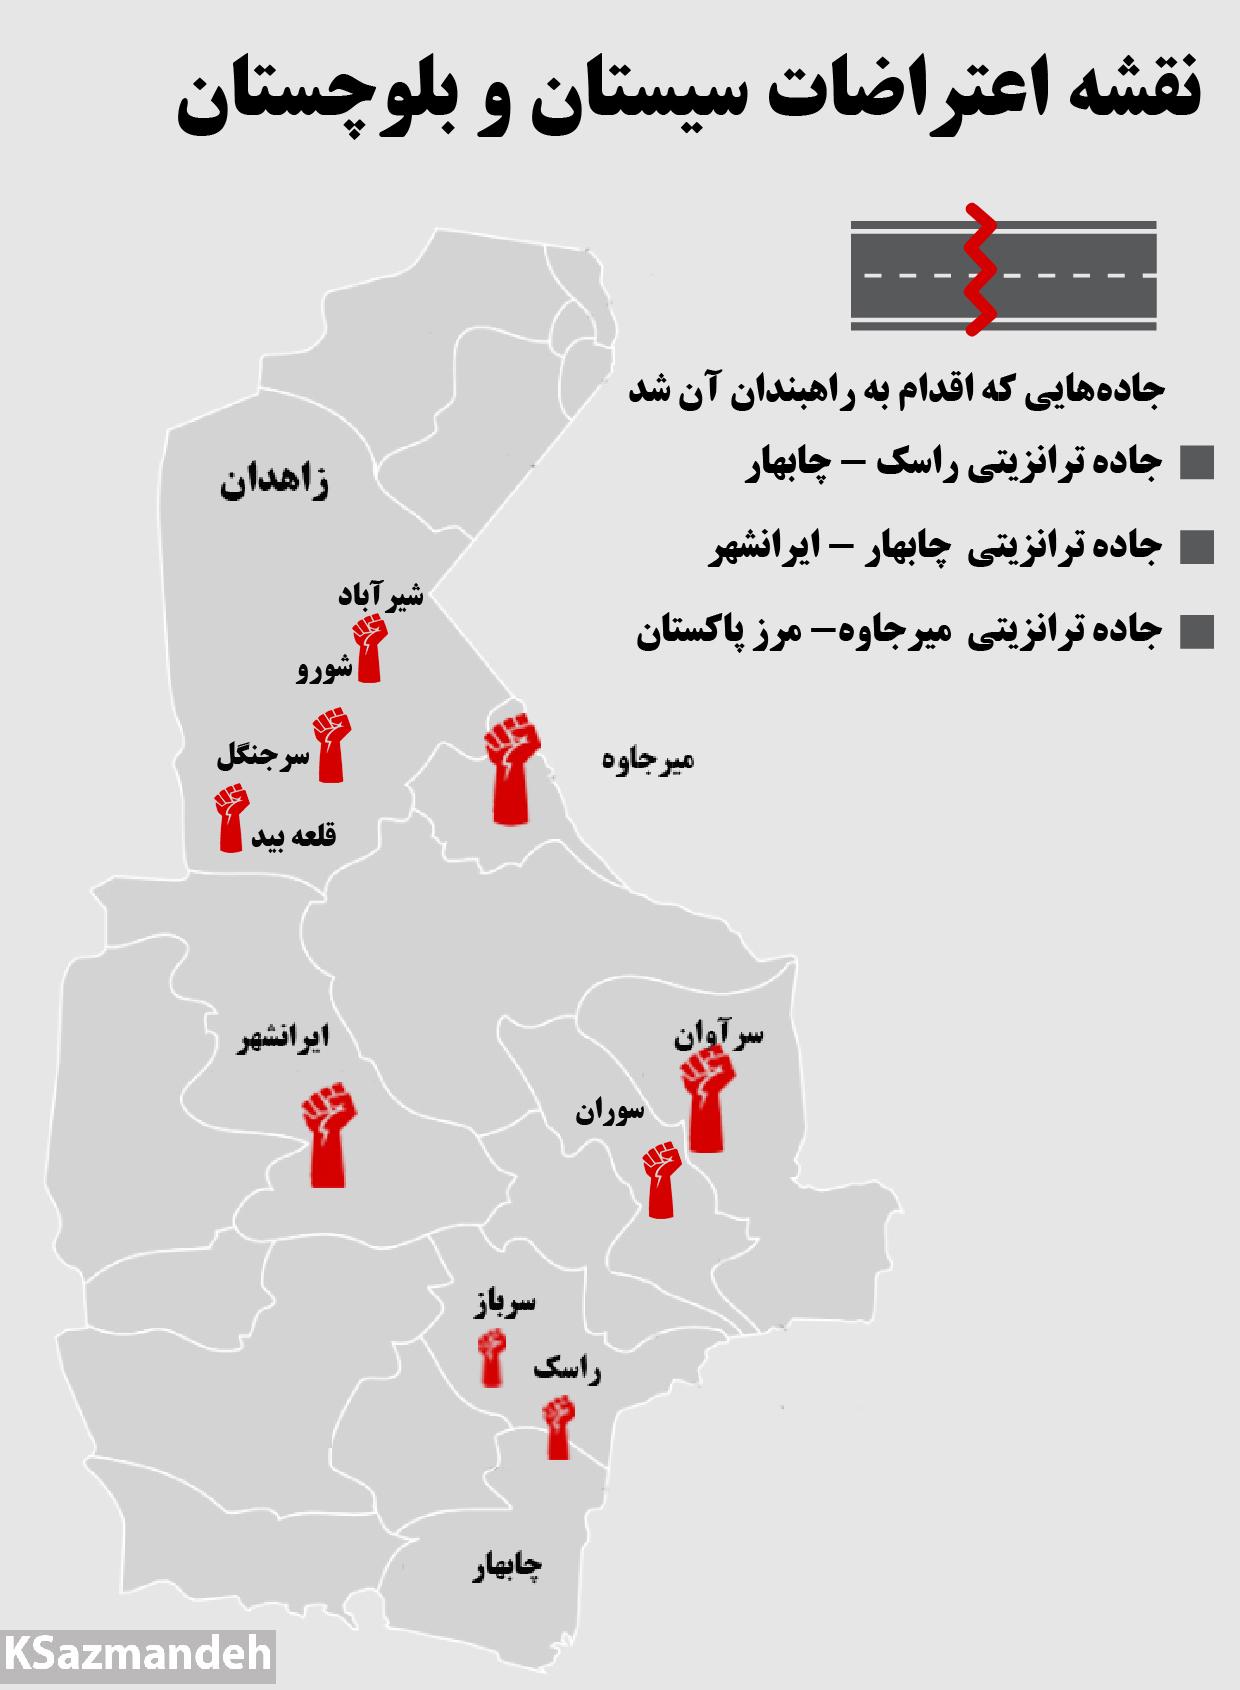 نقشه اعتراضات بلوچستان